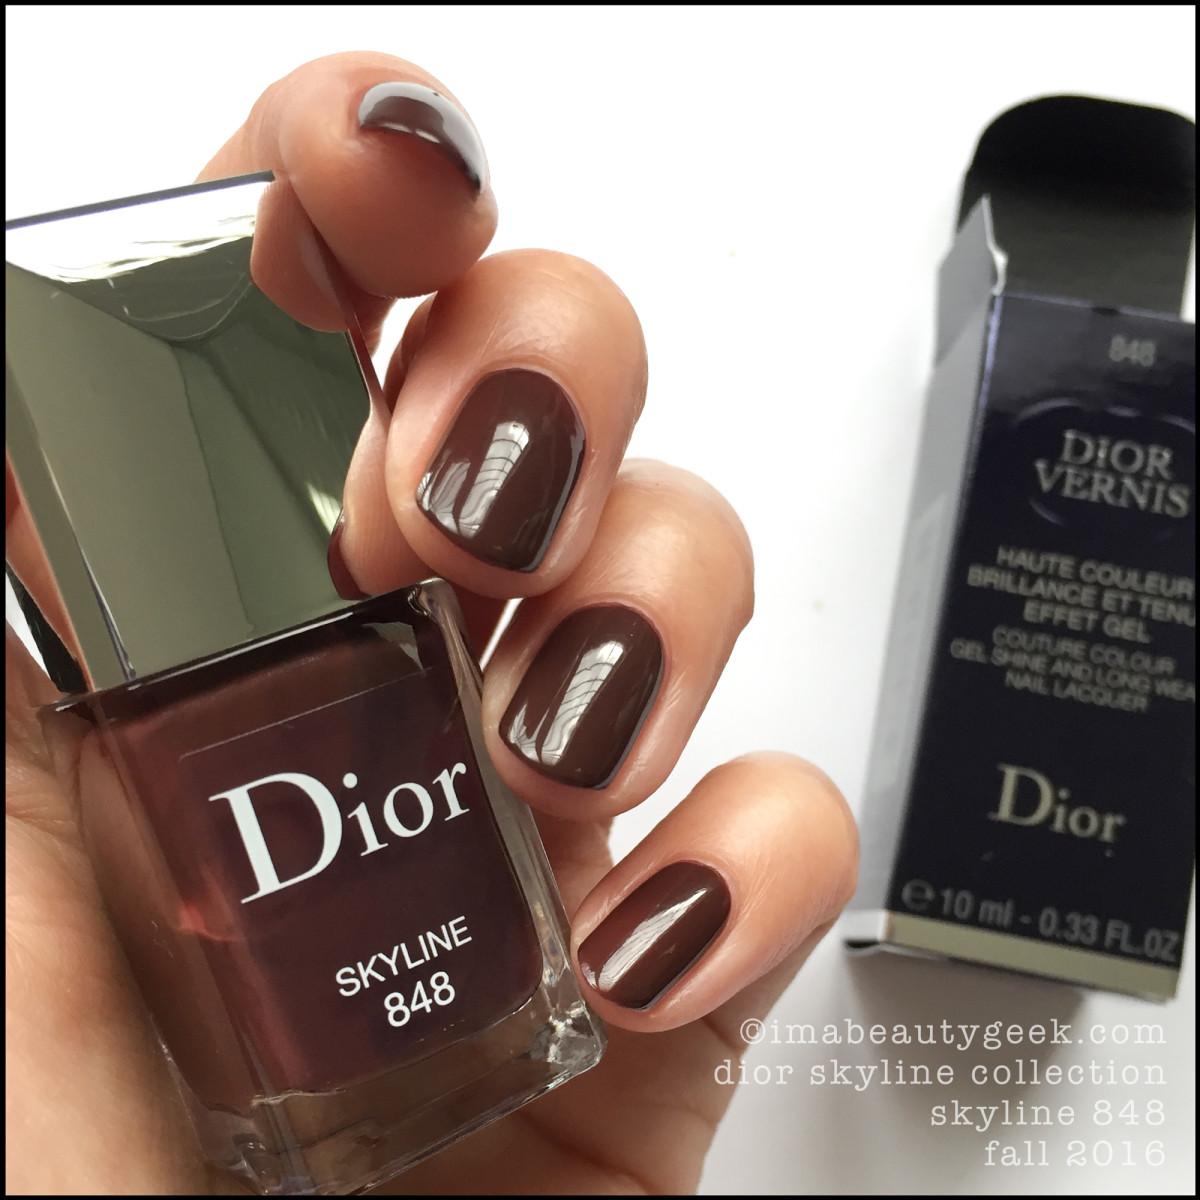 Dior Skyline Vernis Fall 2016_Dior Skyline Collection Nail Polish